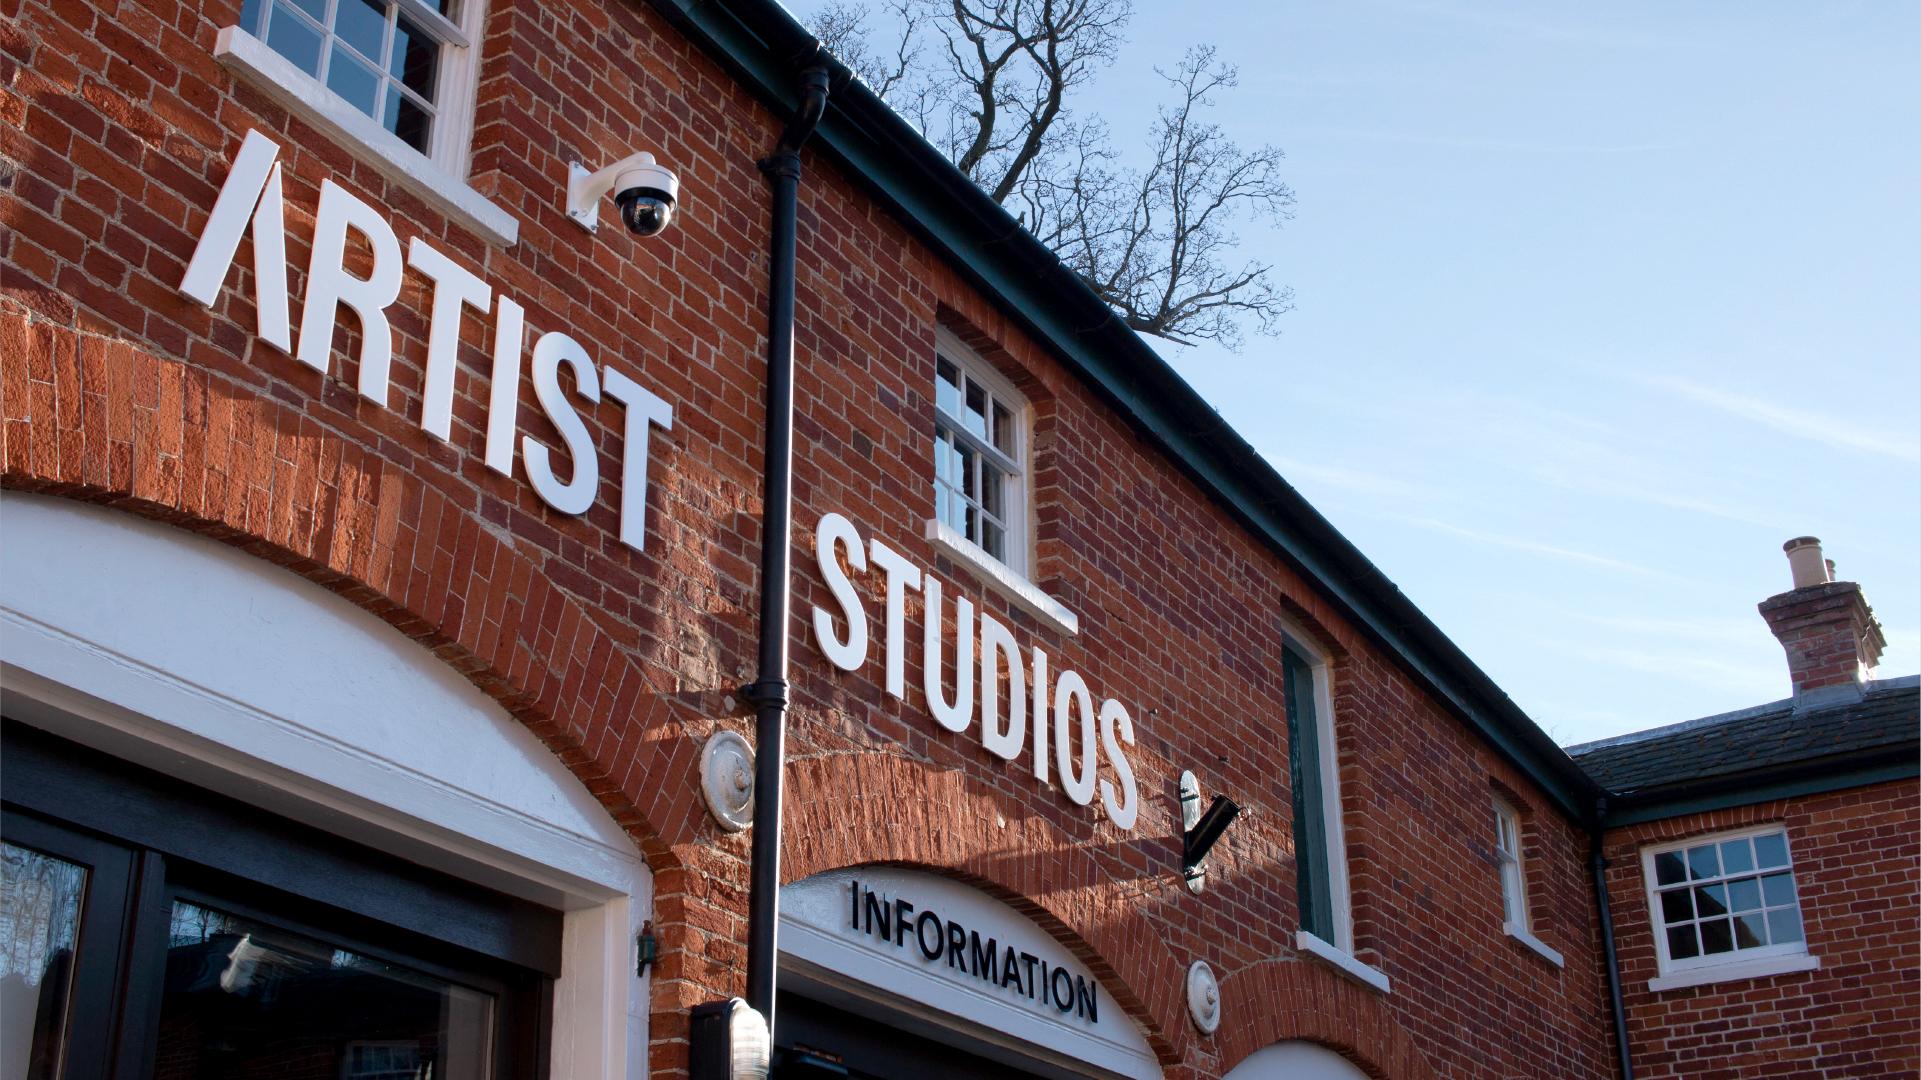 Artist Studios Hylands Estate Brand Identity